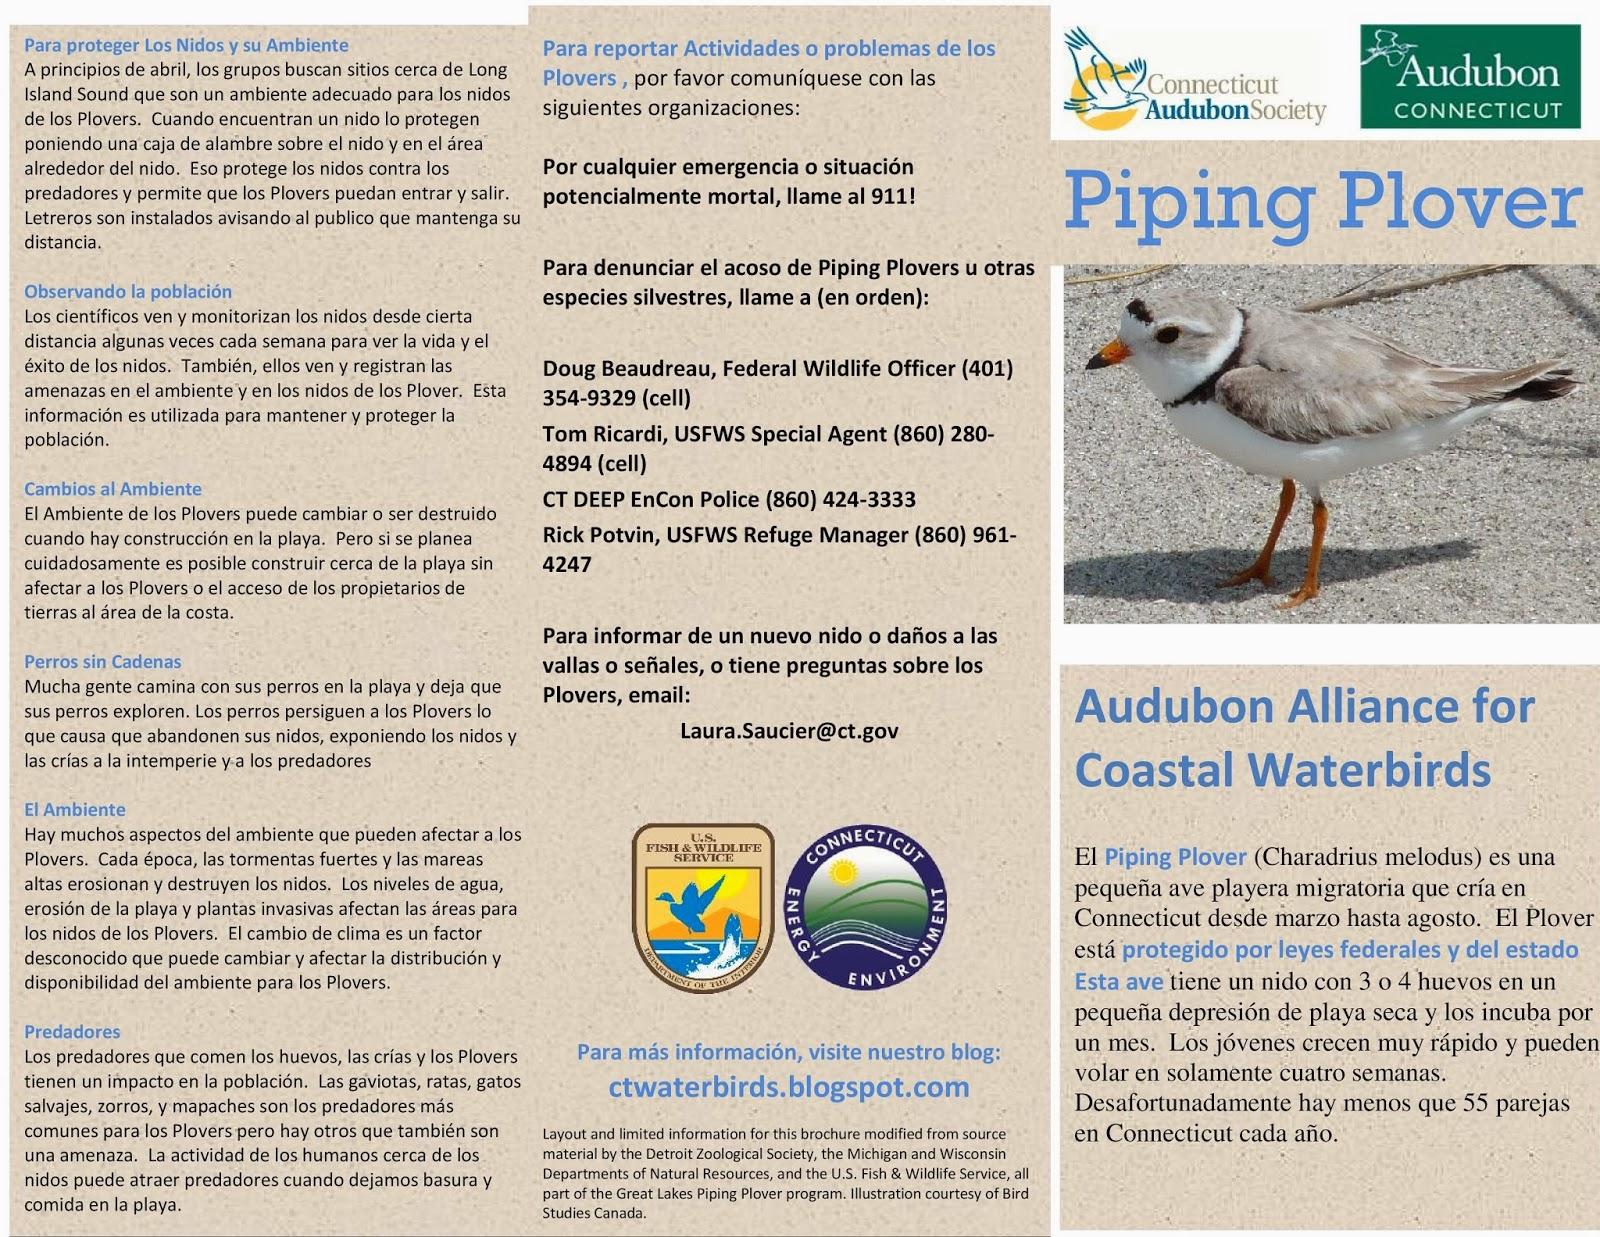 Audubon Alliance for Coastal Waterbirds: Piping Plover